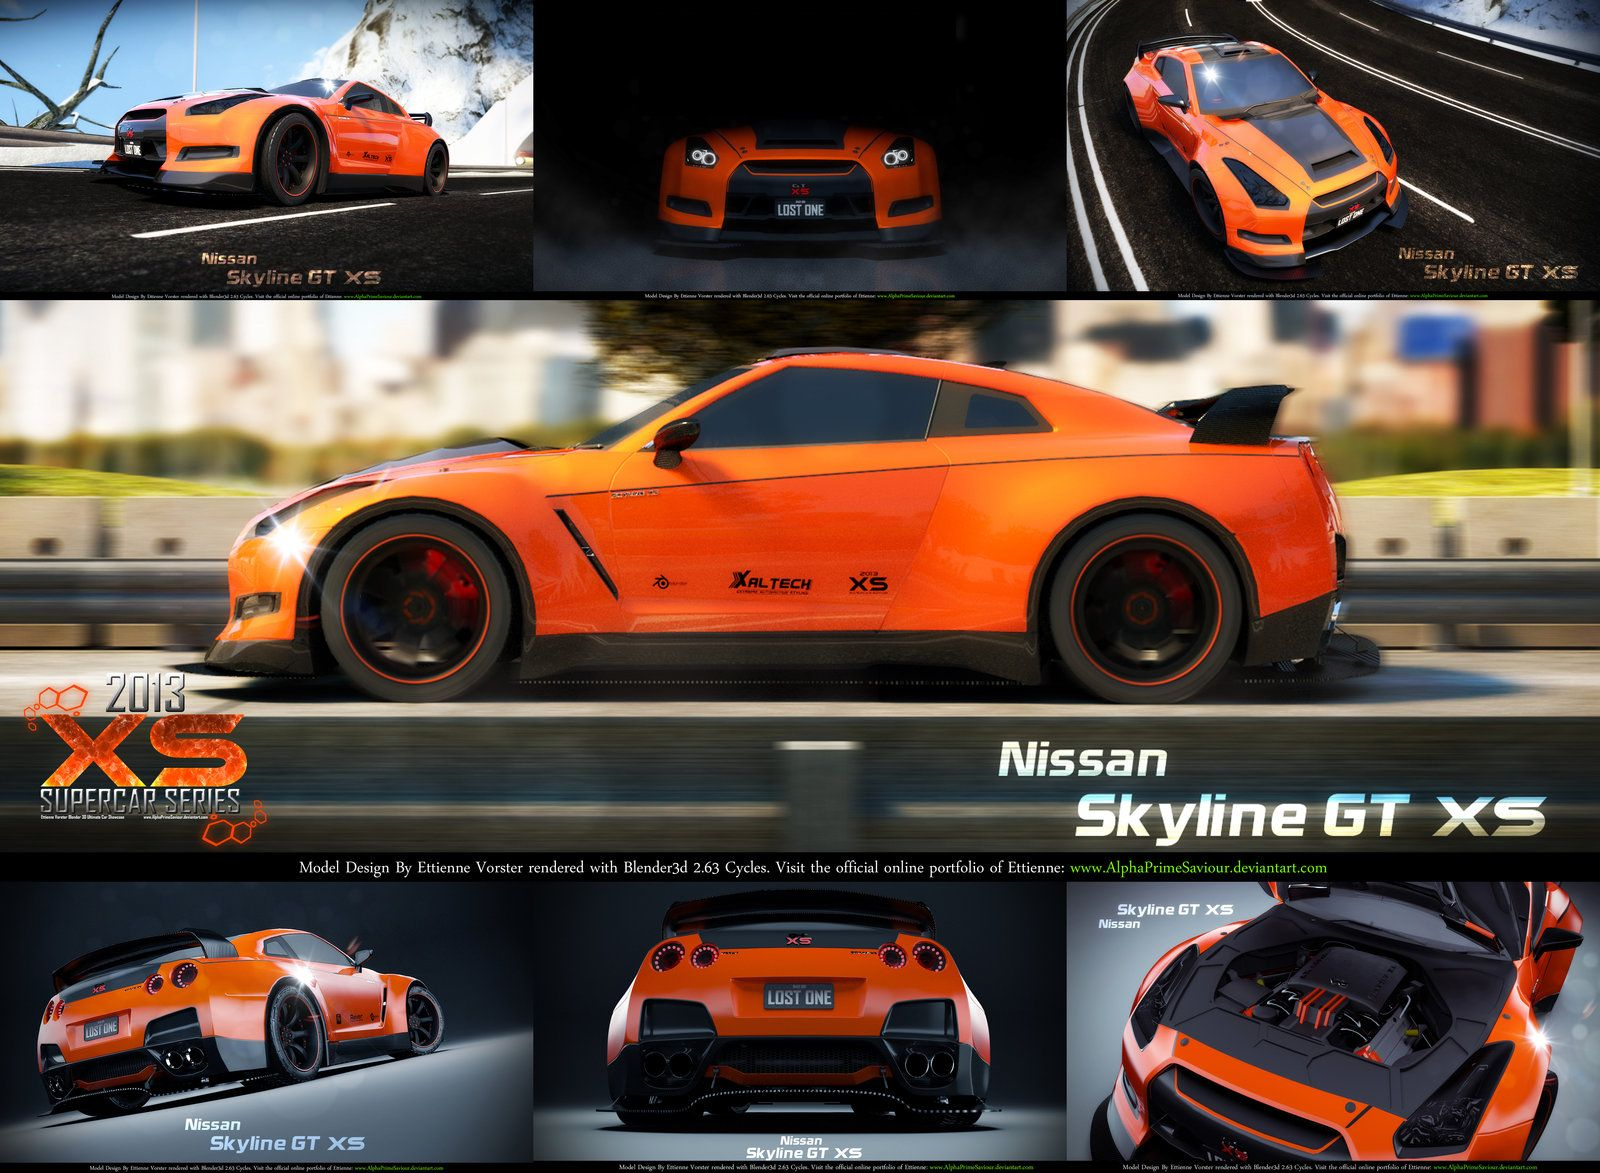 Nissan Skyline GT XS Poster by AlphaPrimeSaviour